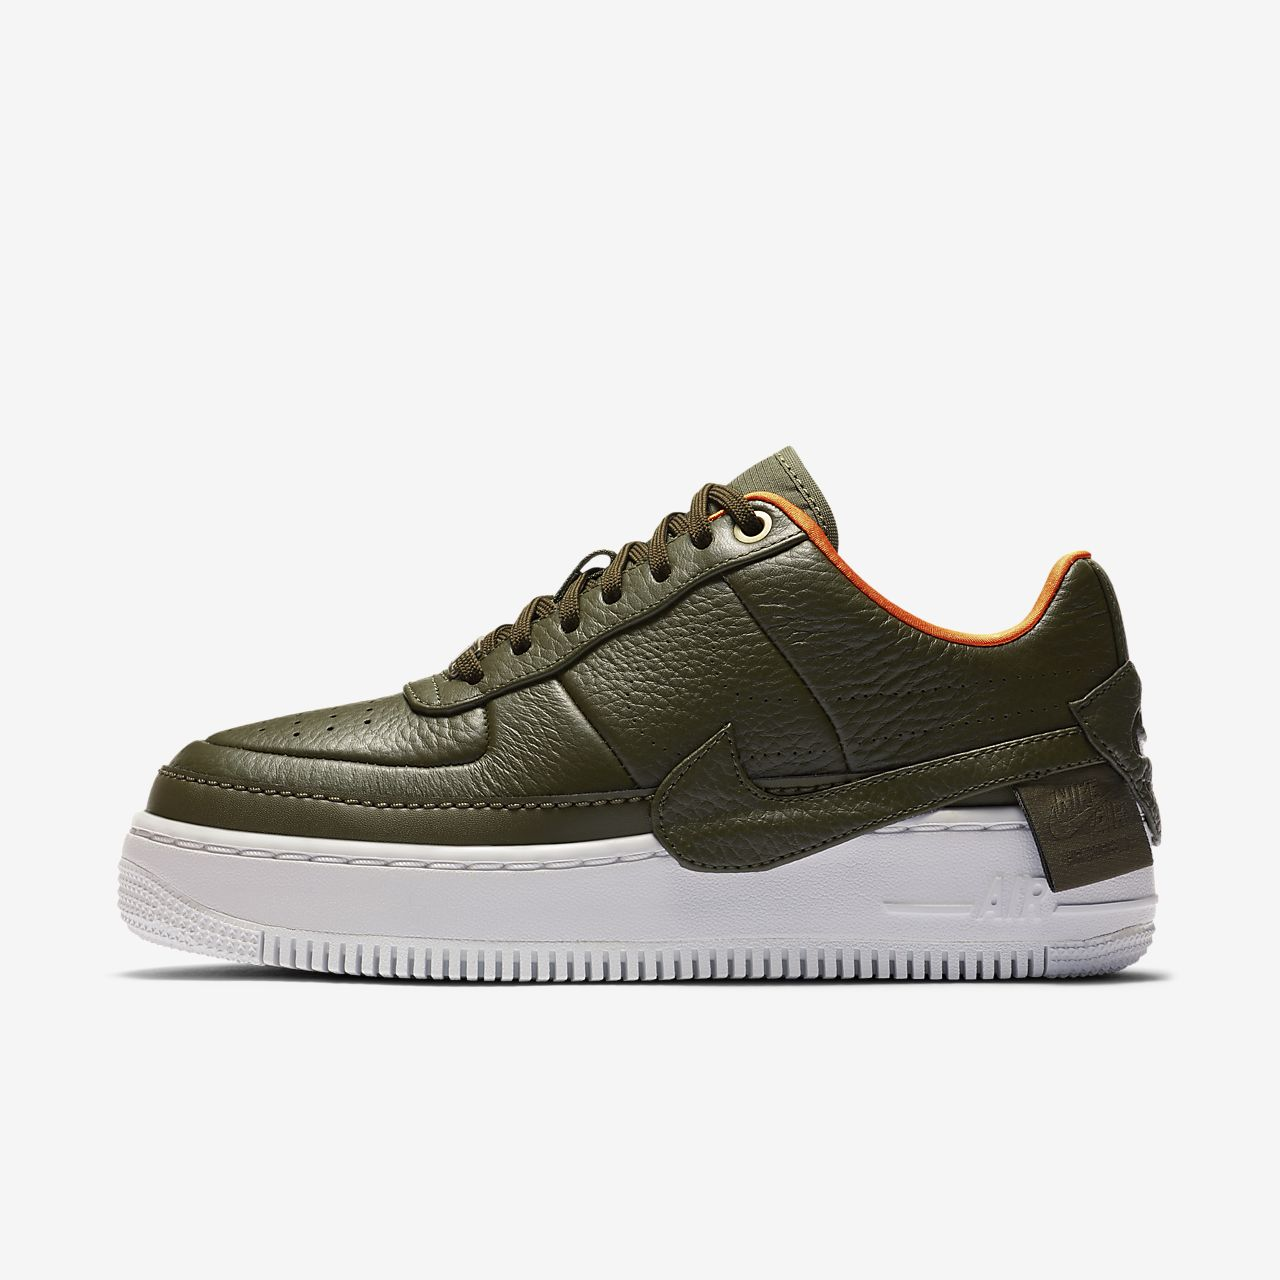 online retailer a4647 237e7 ... Nike Air Force 1 Jester XX Premium-sko til kvinder